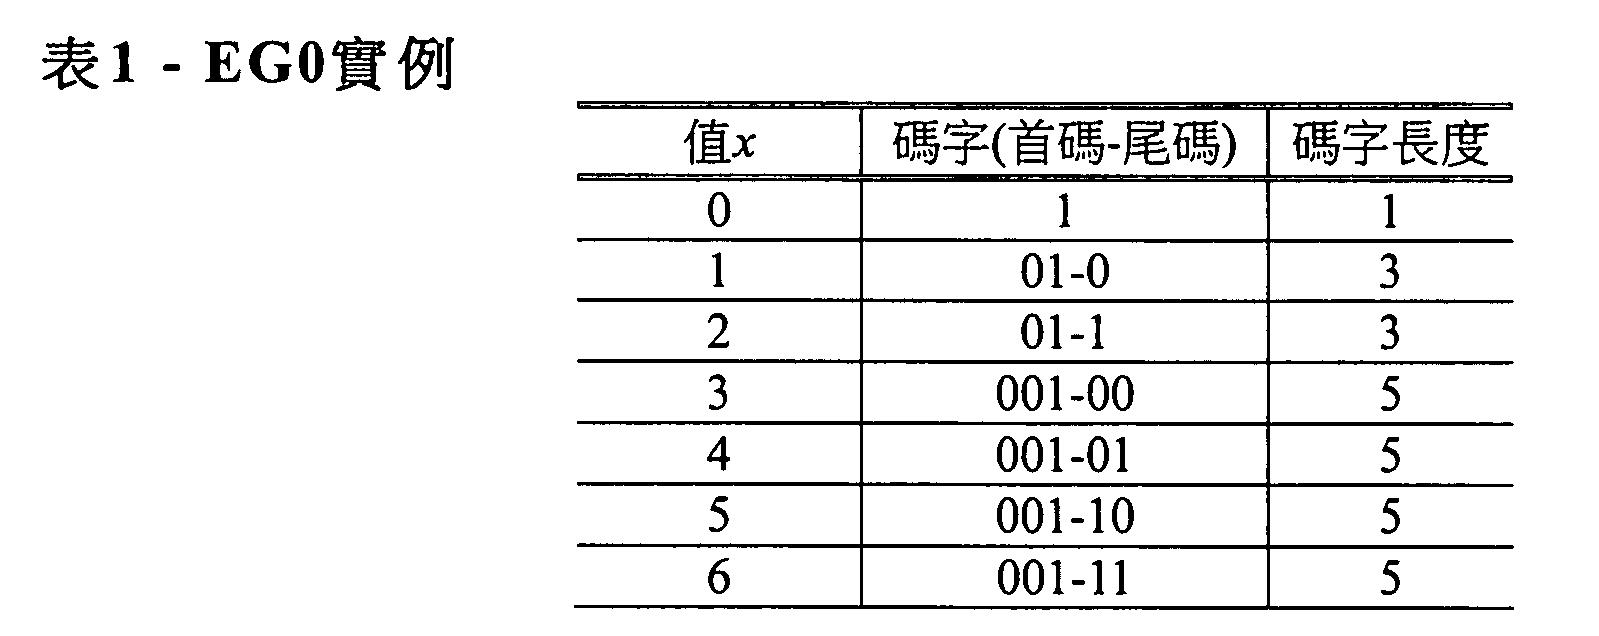 Figure 104116565-A0101-12-0049-2